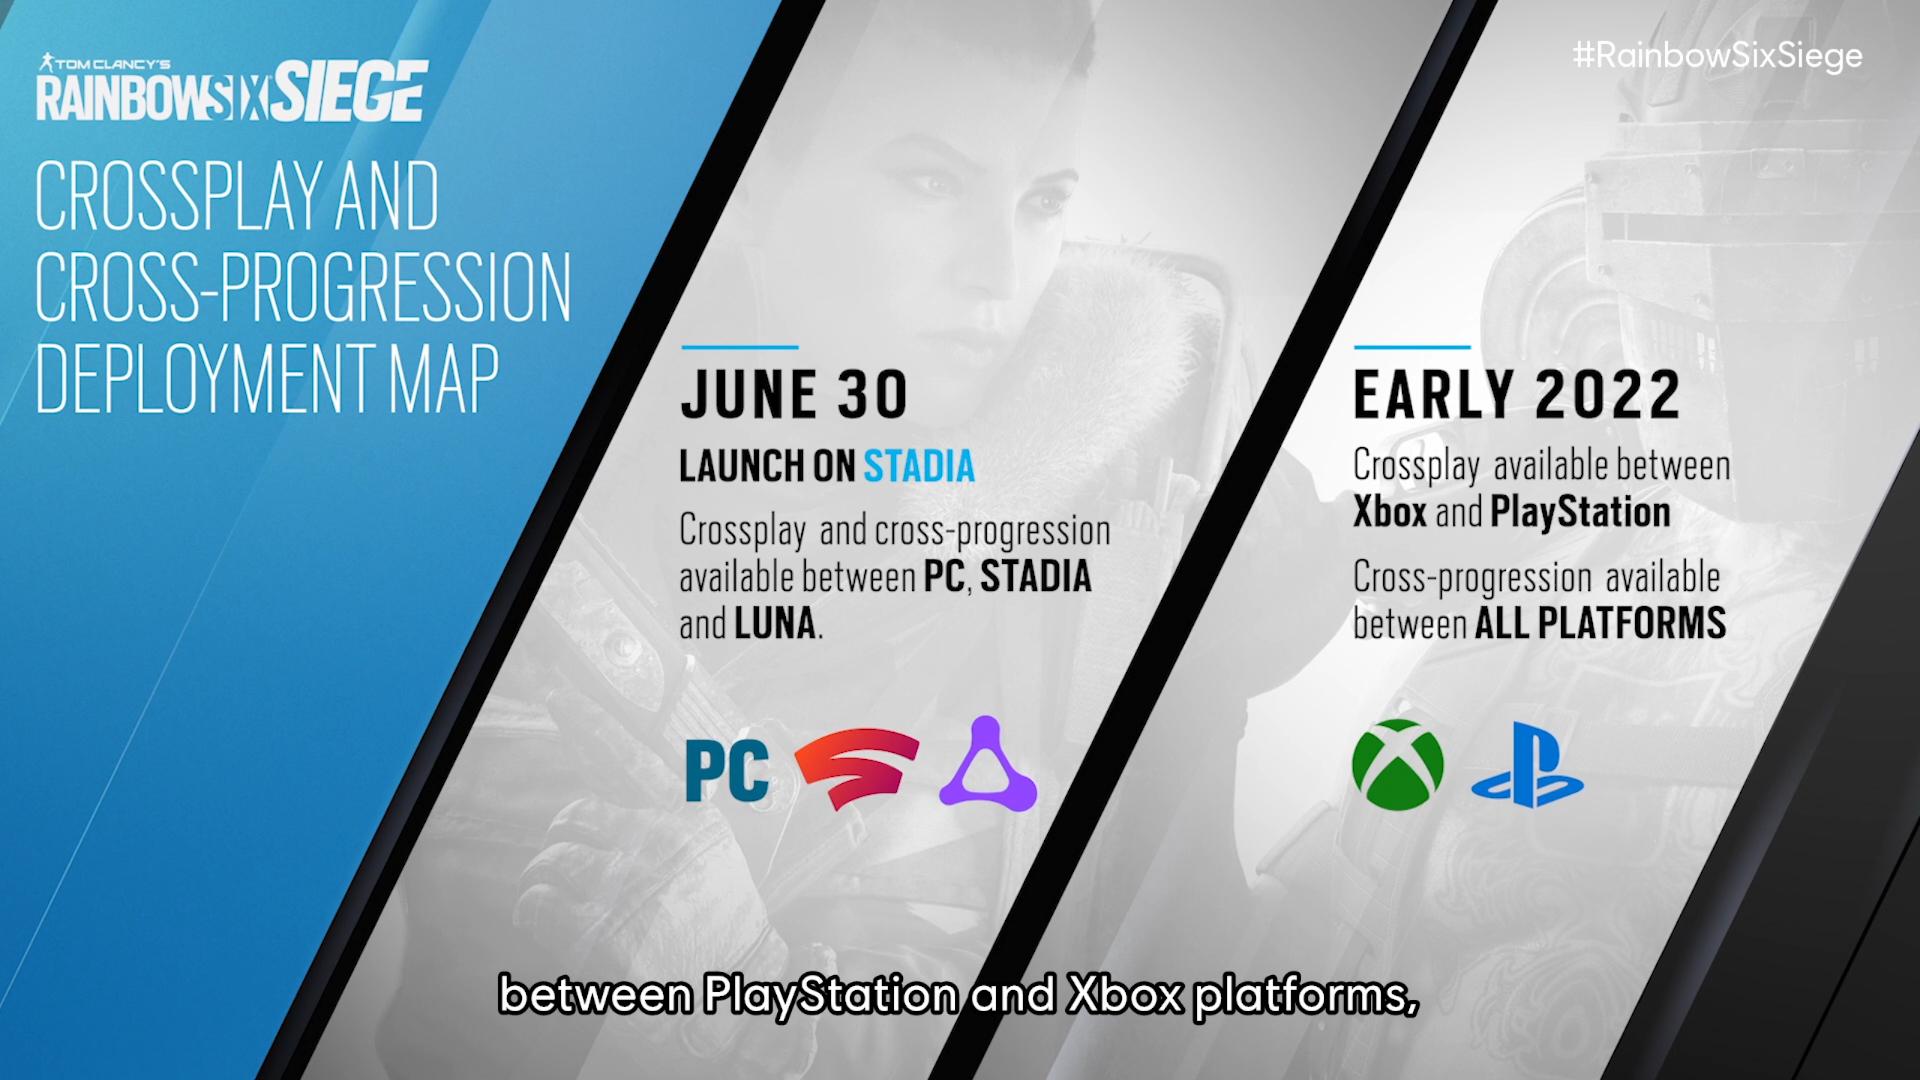 Rainbow Six Siege cross-play and cross-progression announced at Ubisoft  Forward E3 2021 | Shacknews